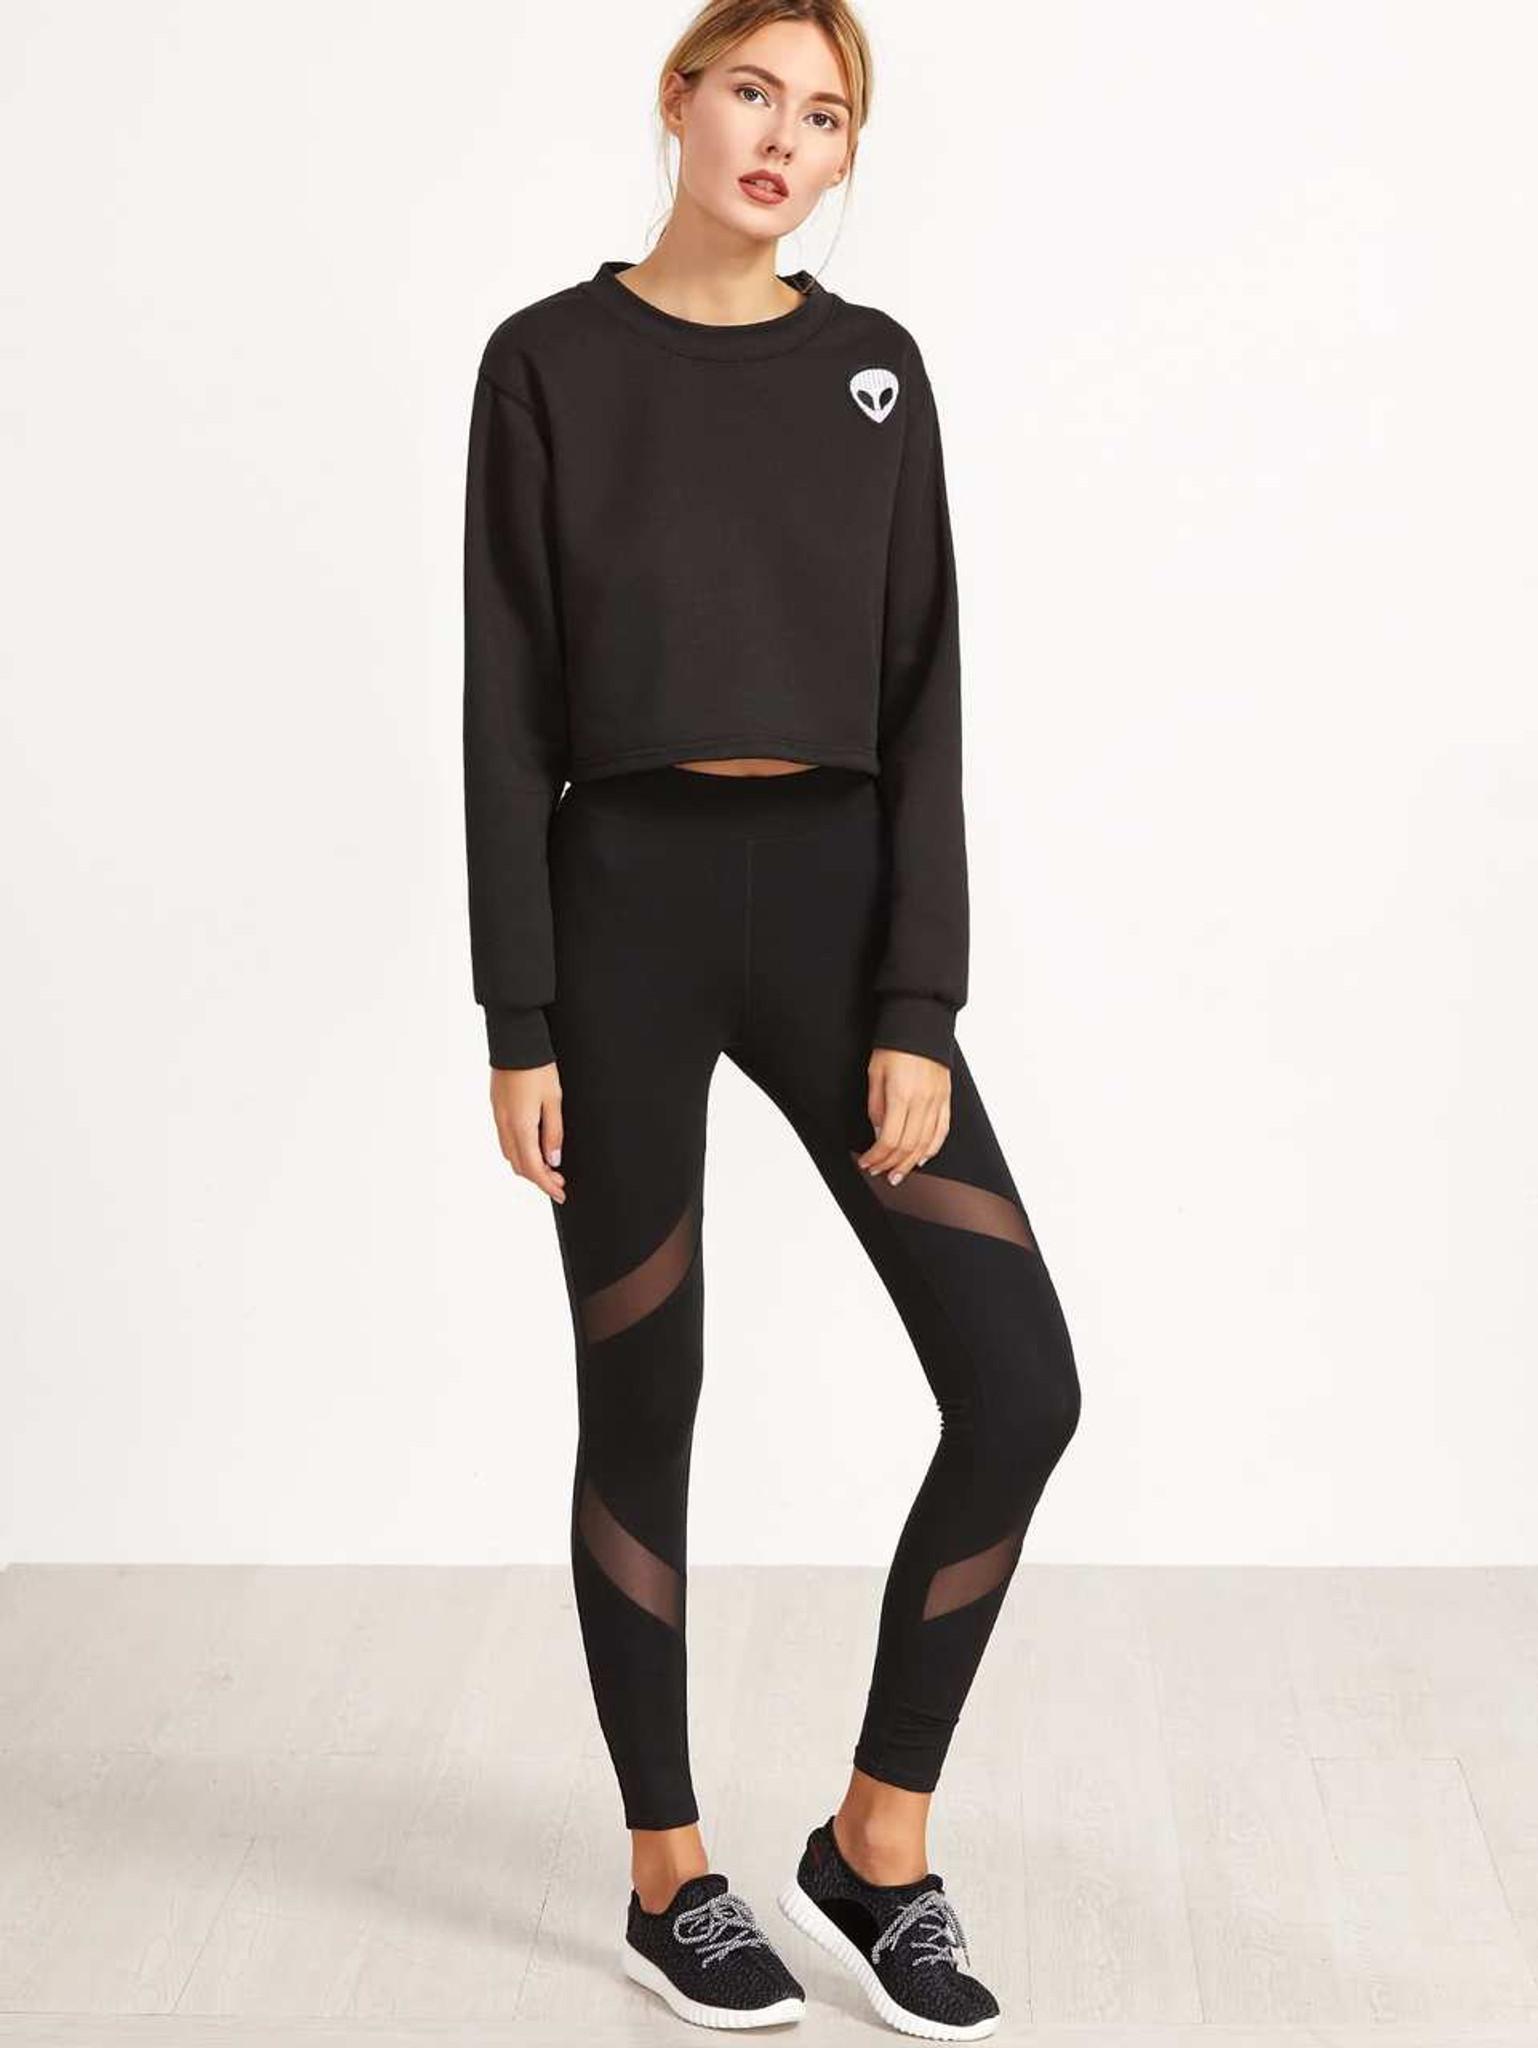 Fifth Avenue U871 Active Mesh Panel Yoga Pants - Black